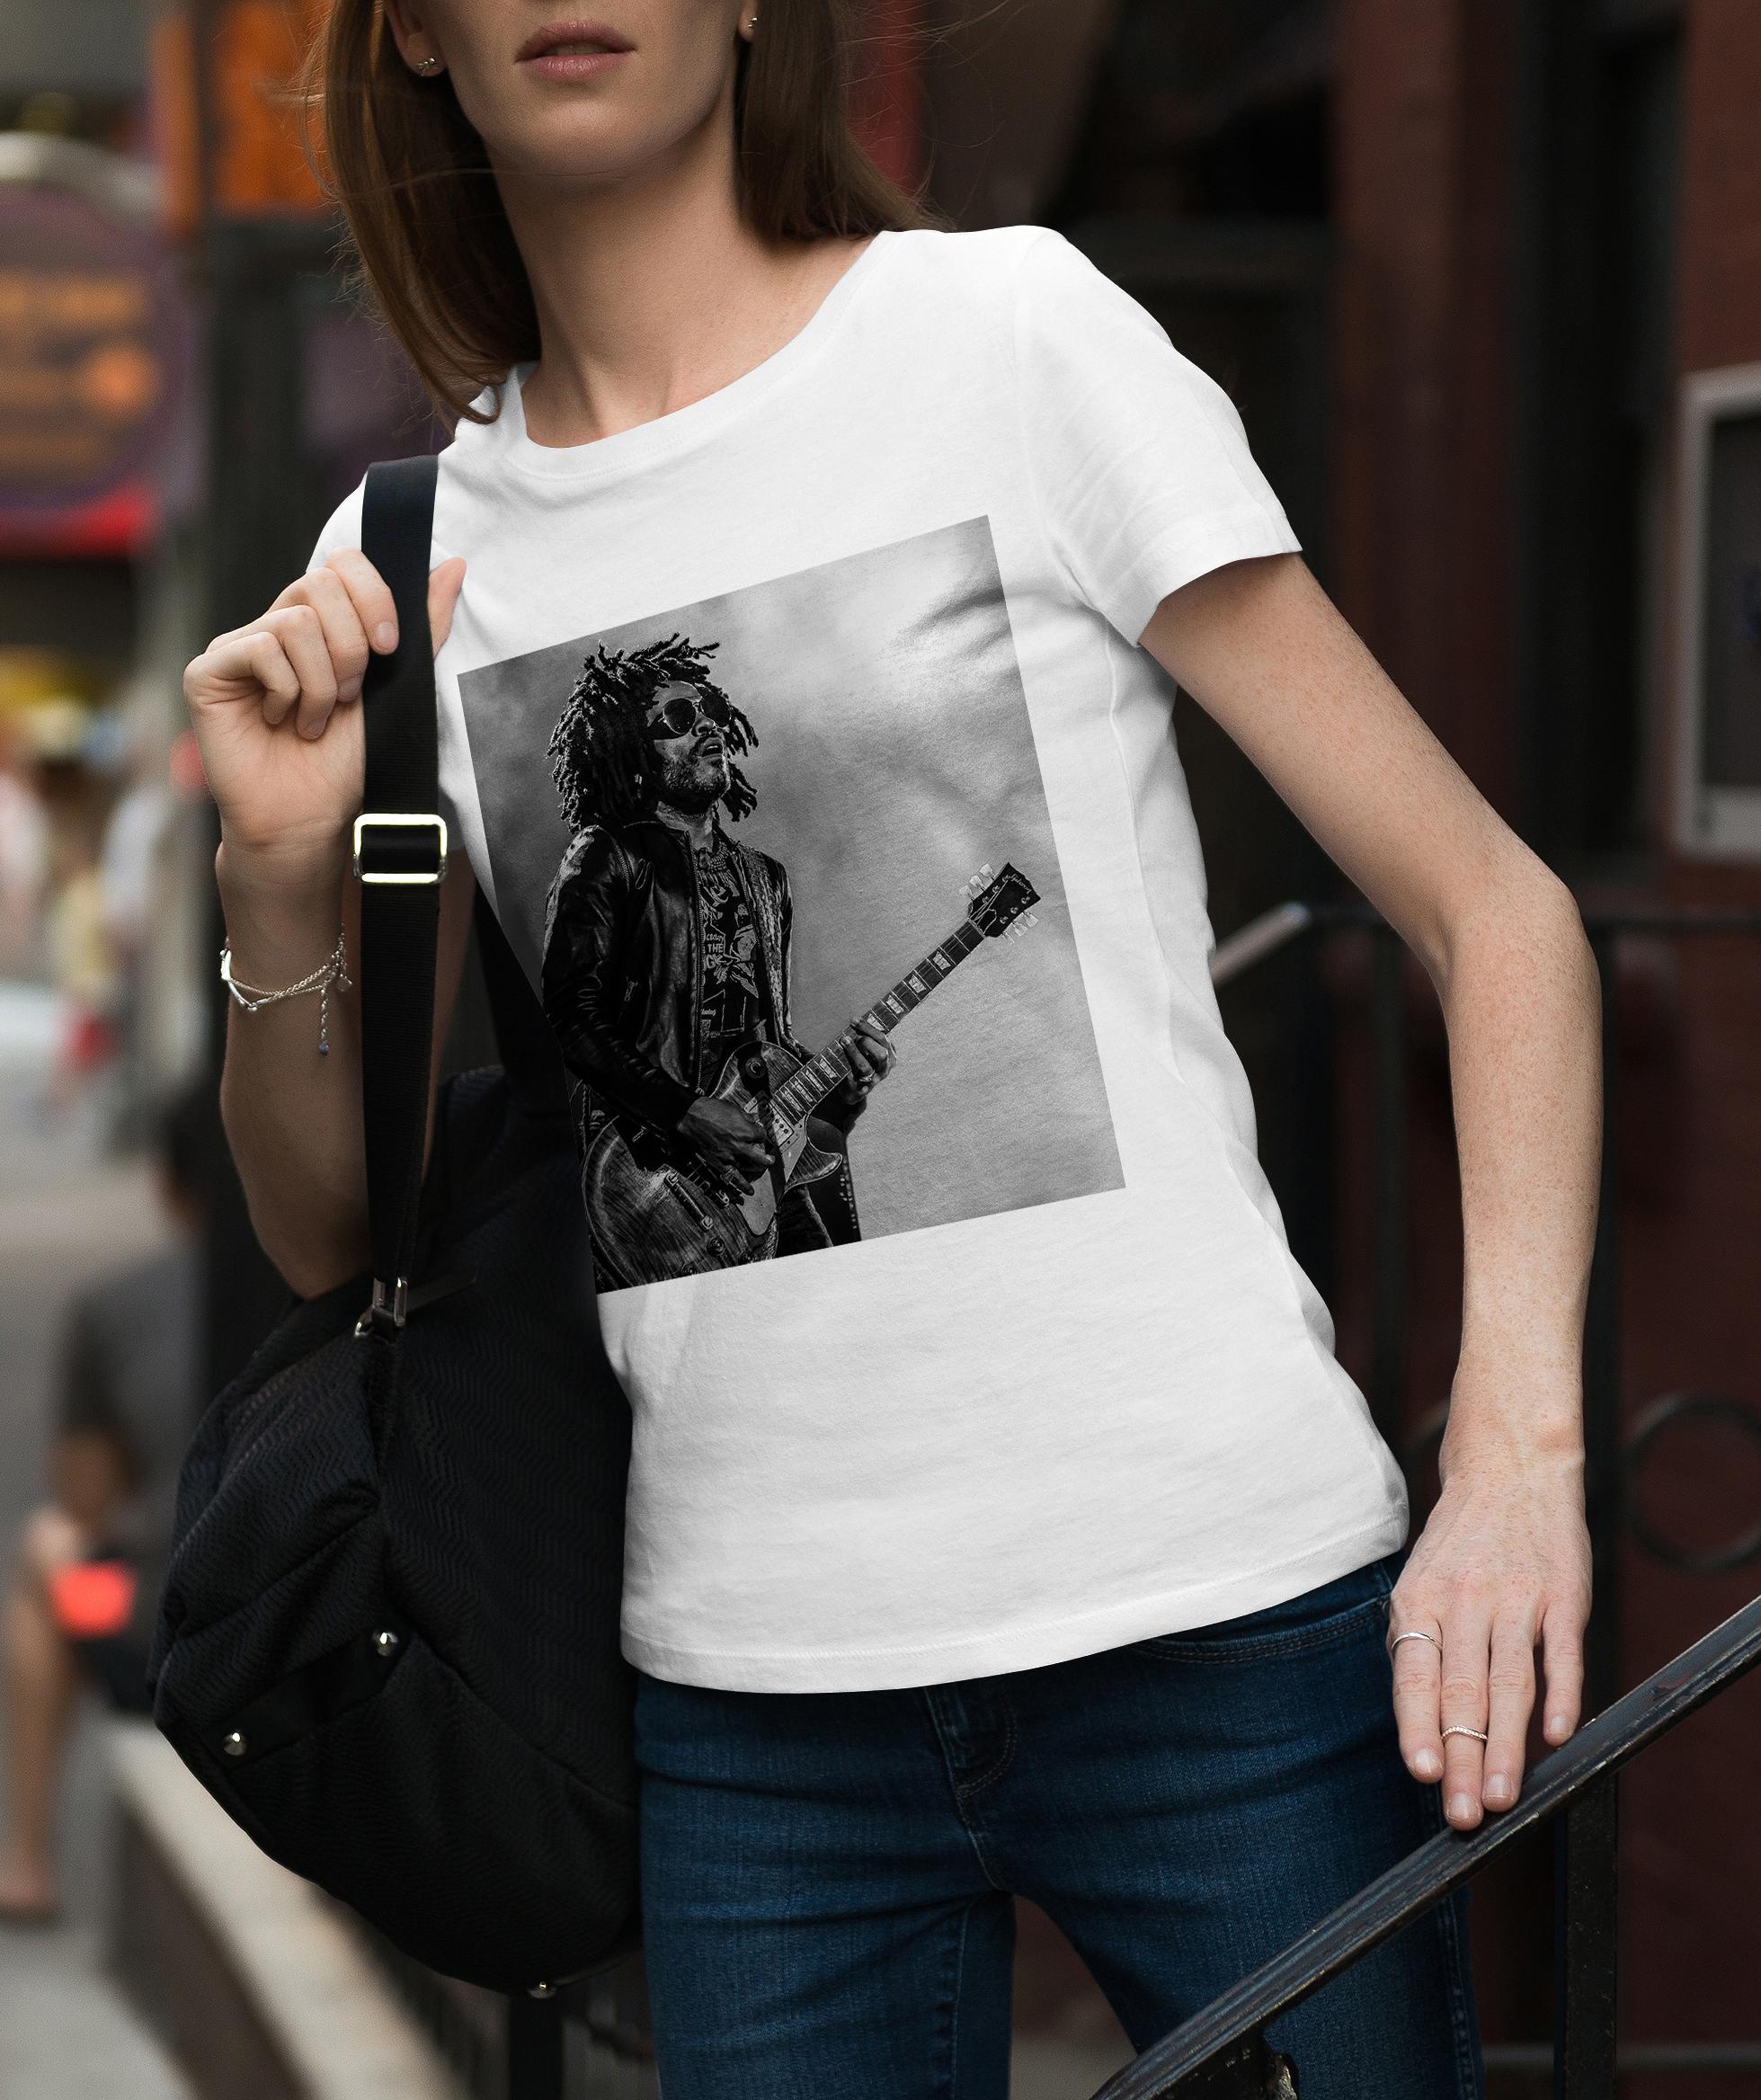 womens lenny kravitz t-shirt